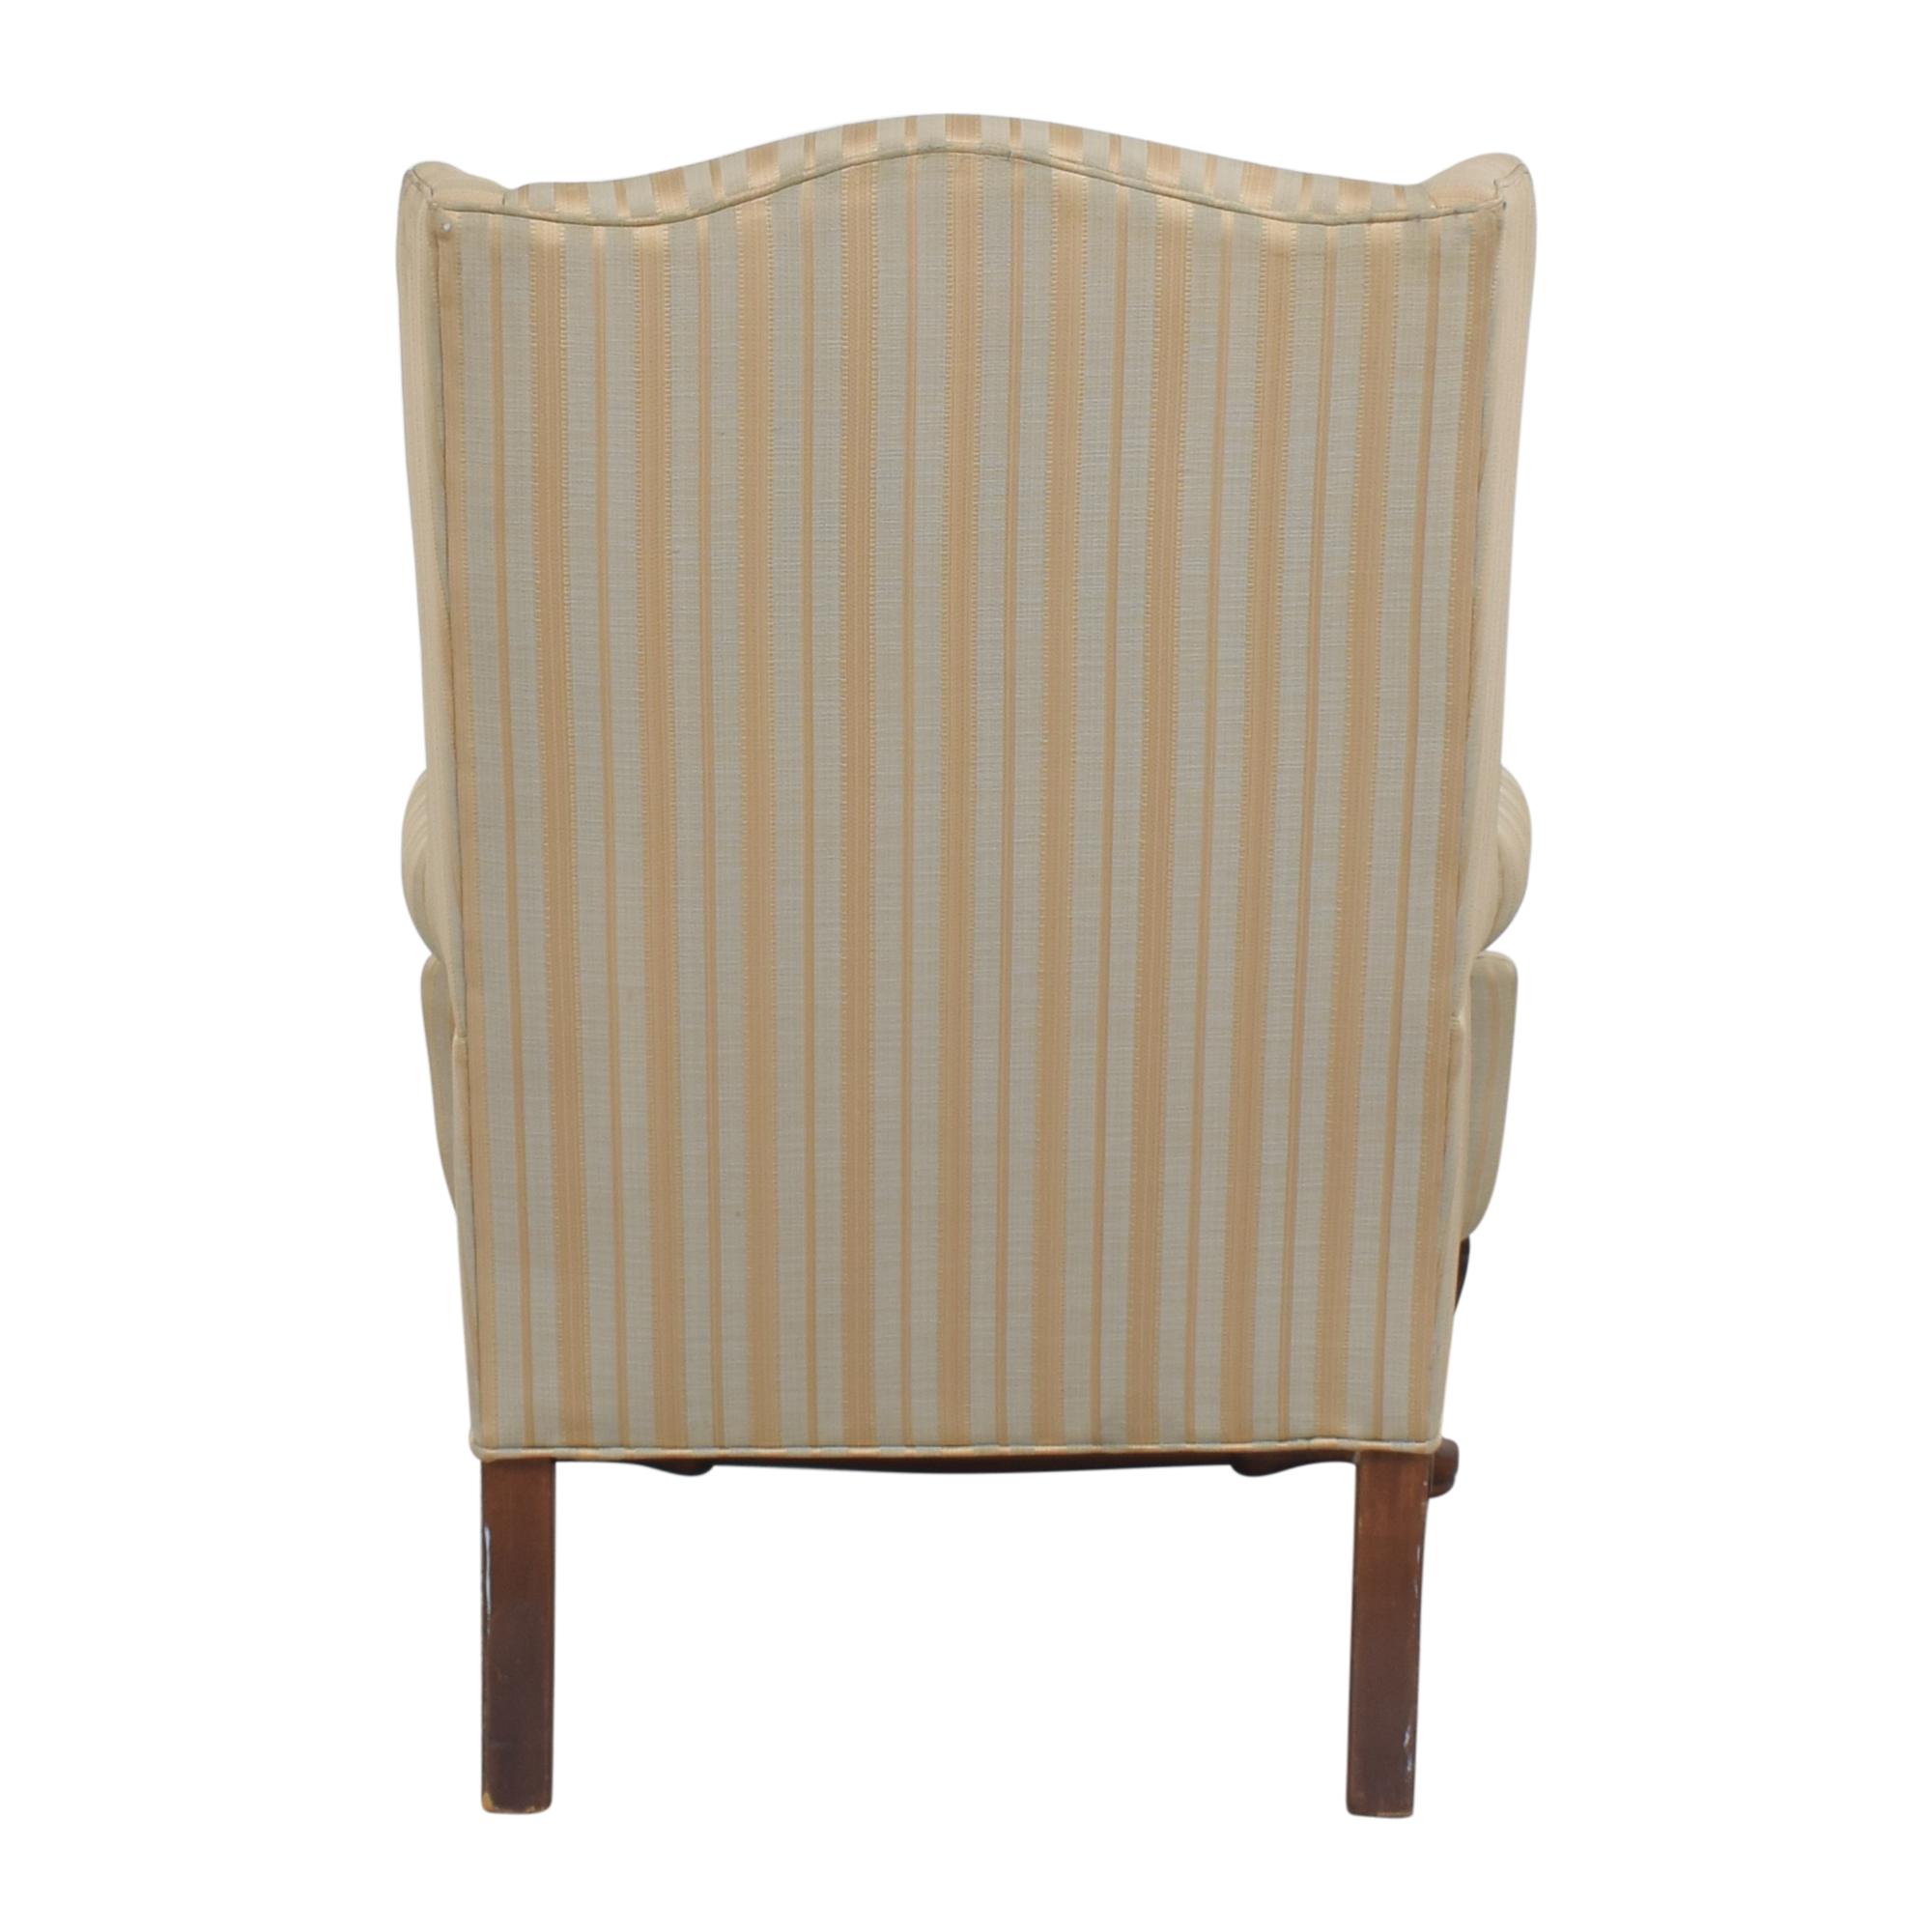 Ethan Allen Ethan Allen Wing Back Chair coupon